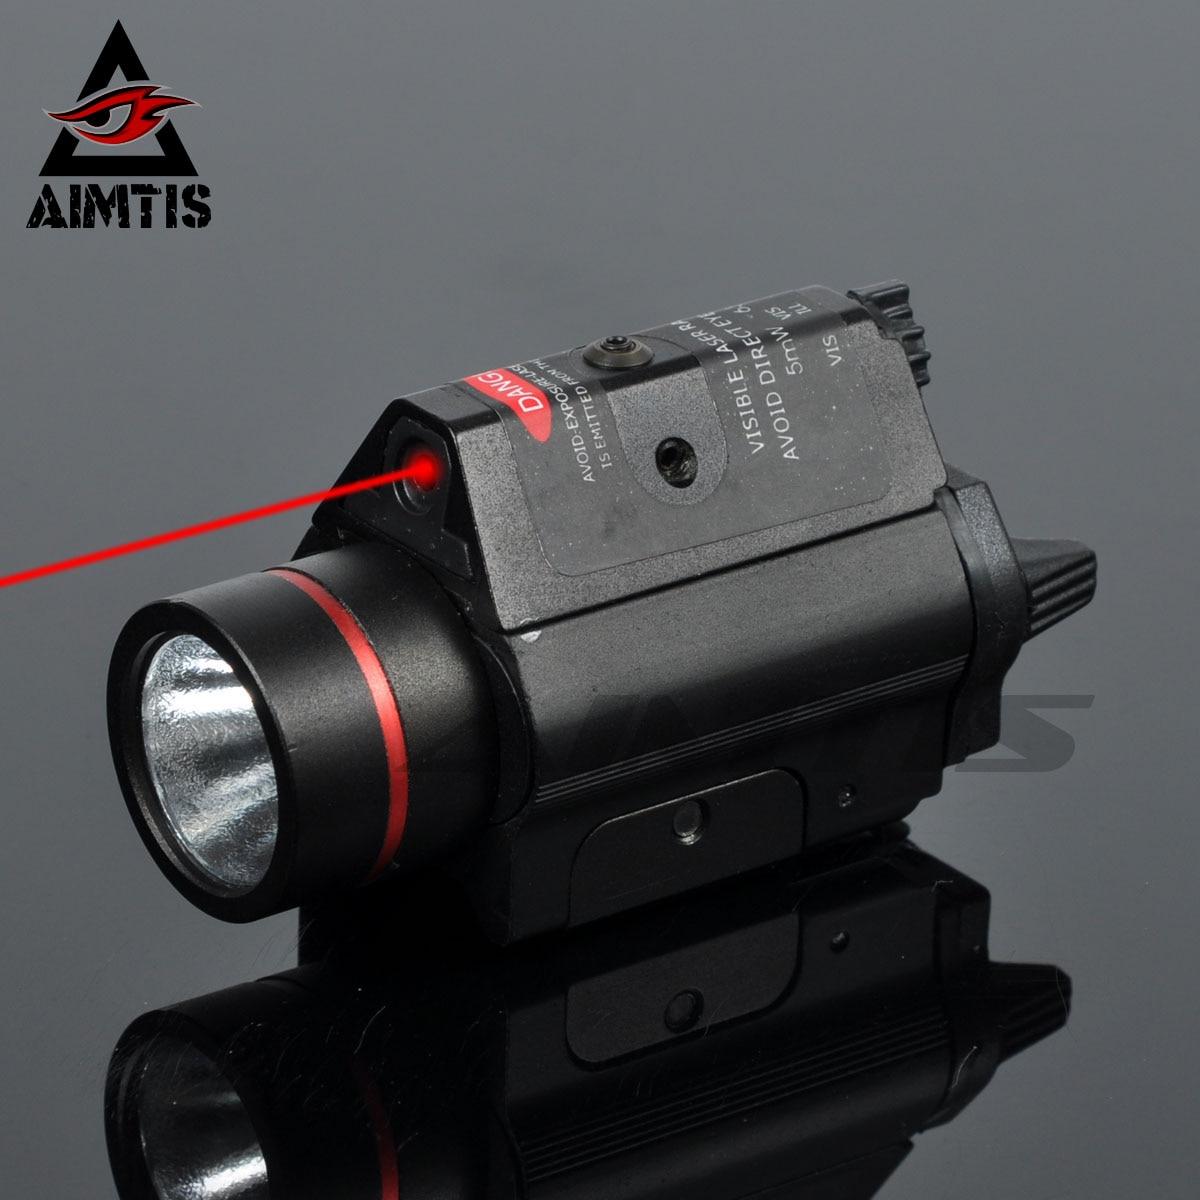 AIMTIS Tactical Red Laser Flashlight Combo Aluminum Head Mini Glock Pistol Gun Light Lanterna Airsoft Light